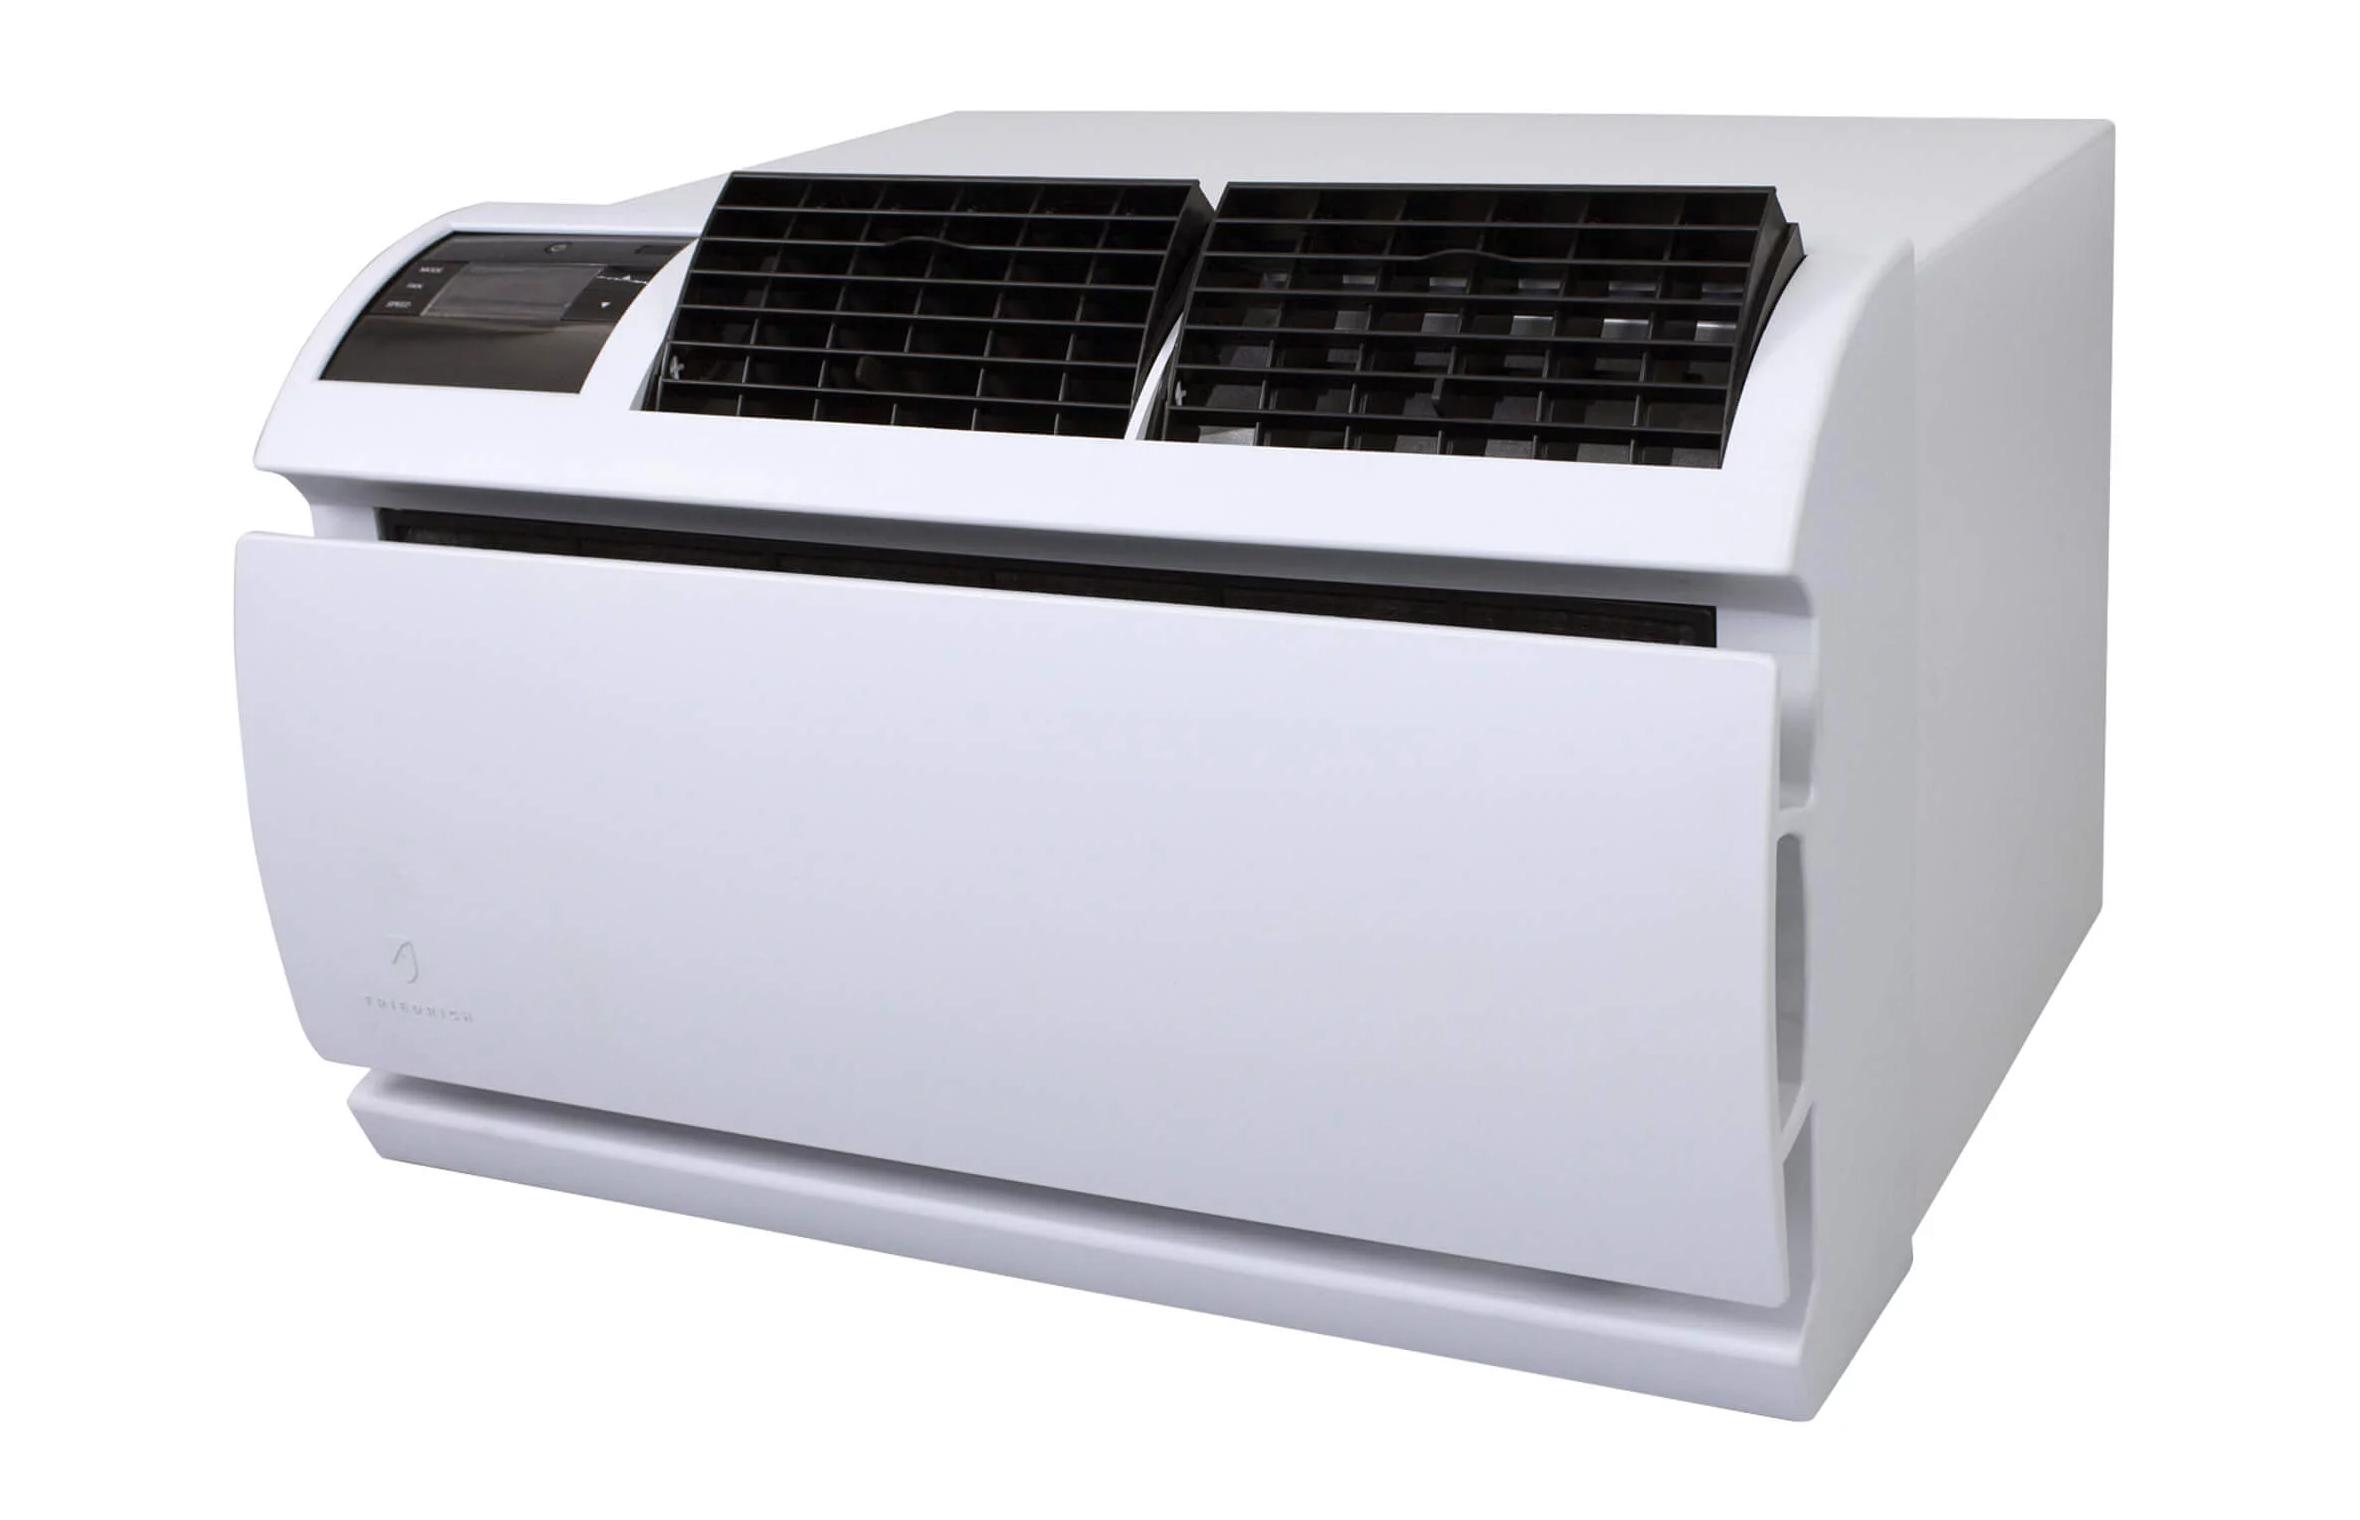 Friedrich WHT12A33A Wallmaster Series 12000 BTU Class Smart WiFi Through-the-Wall Air Conditioner with Electric Heat - 208/230 Volt